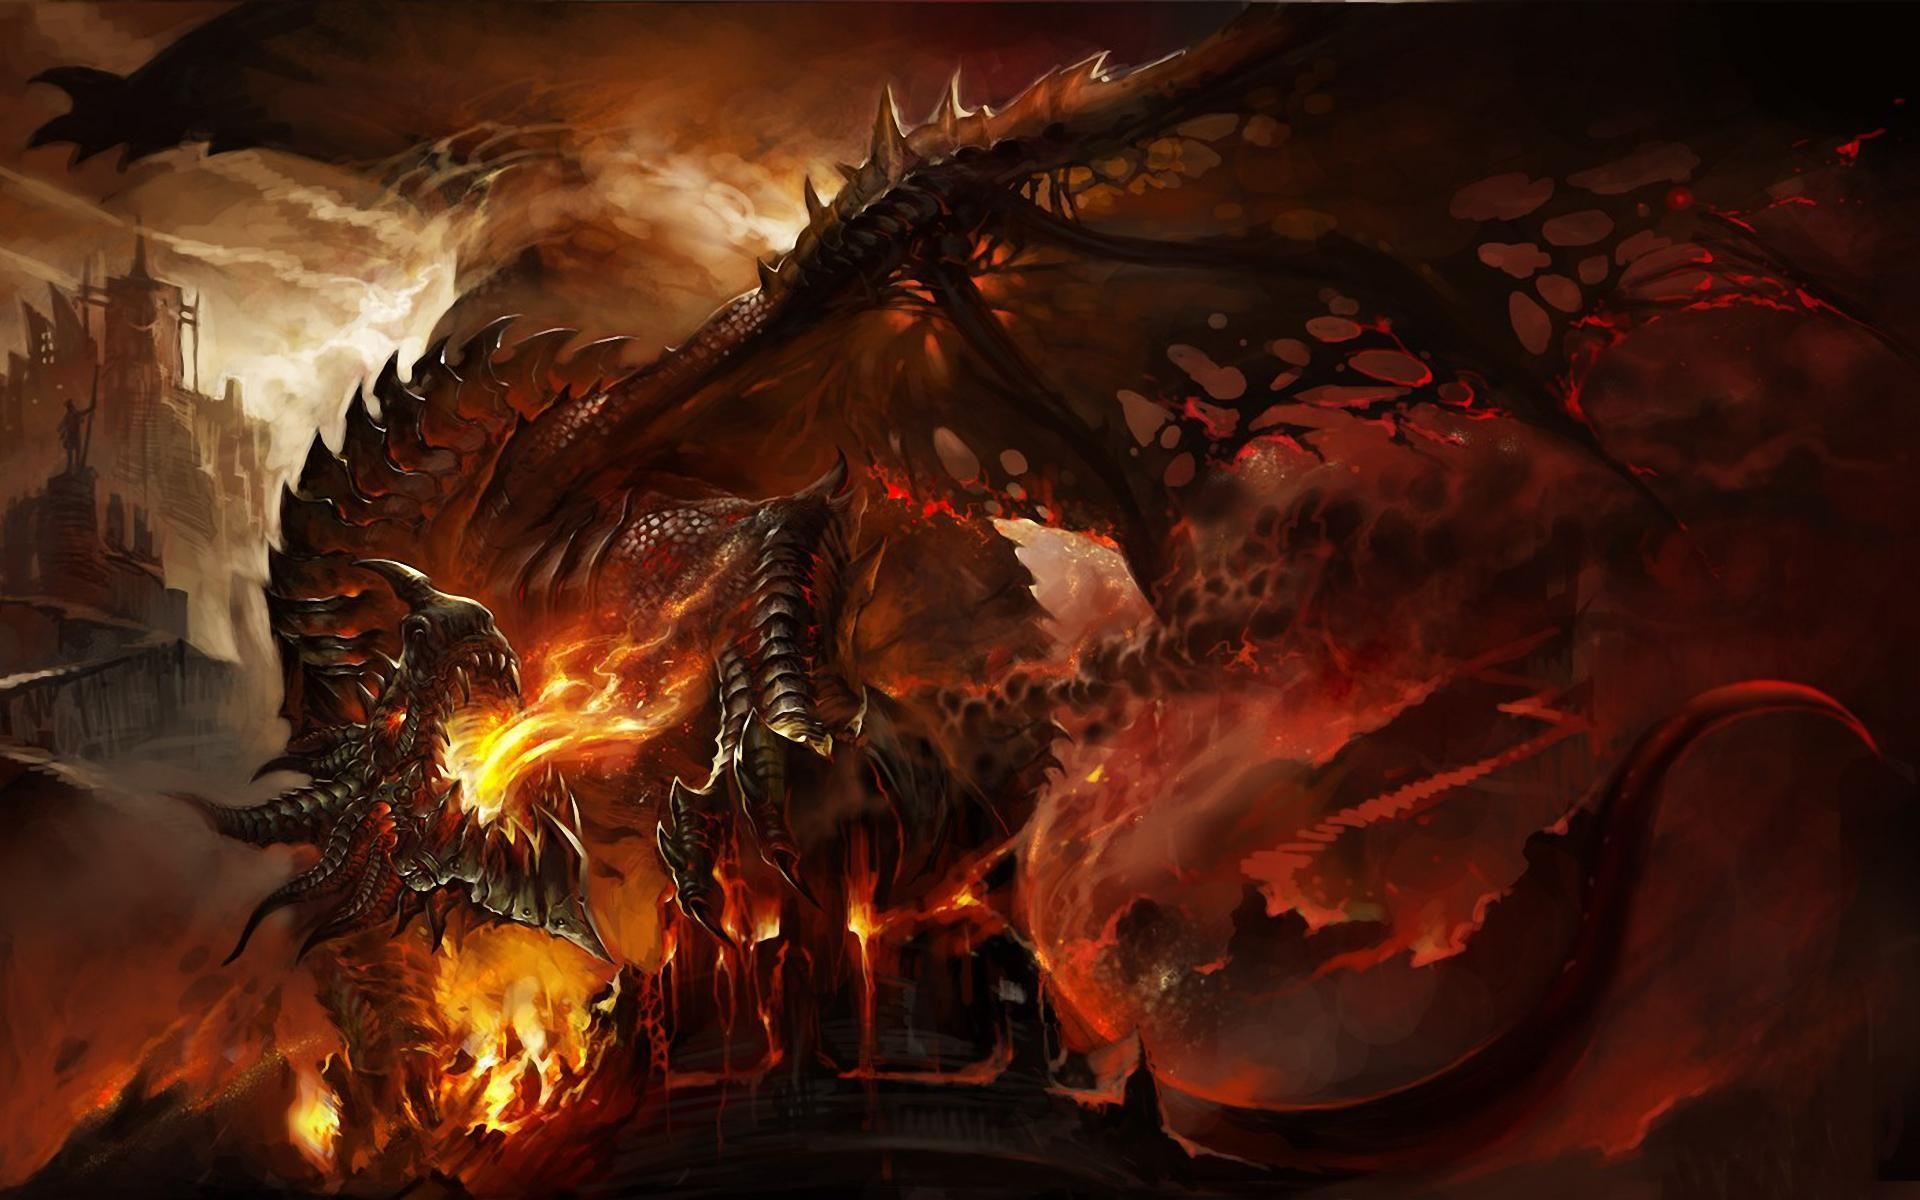 red_hot_dragon.jpg (1920×1200)